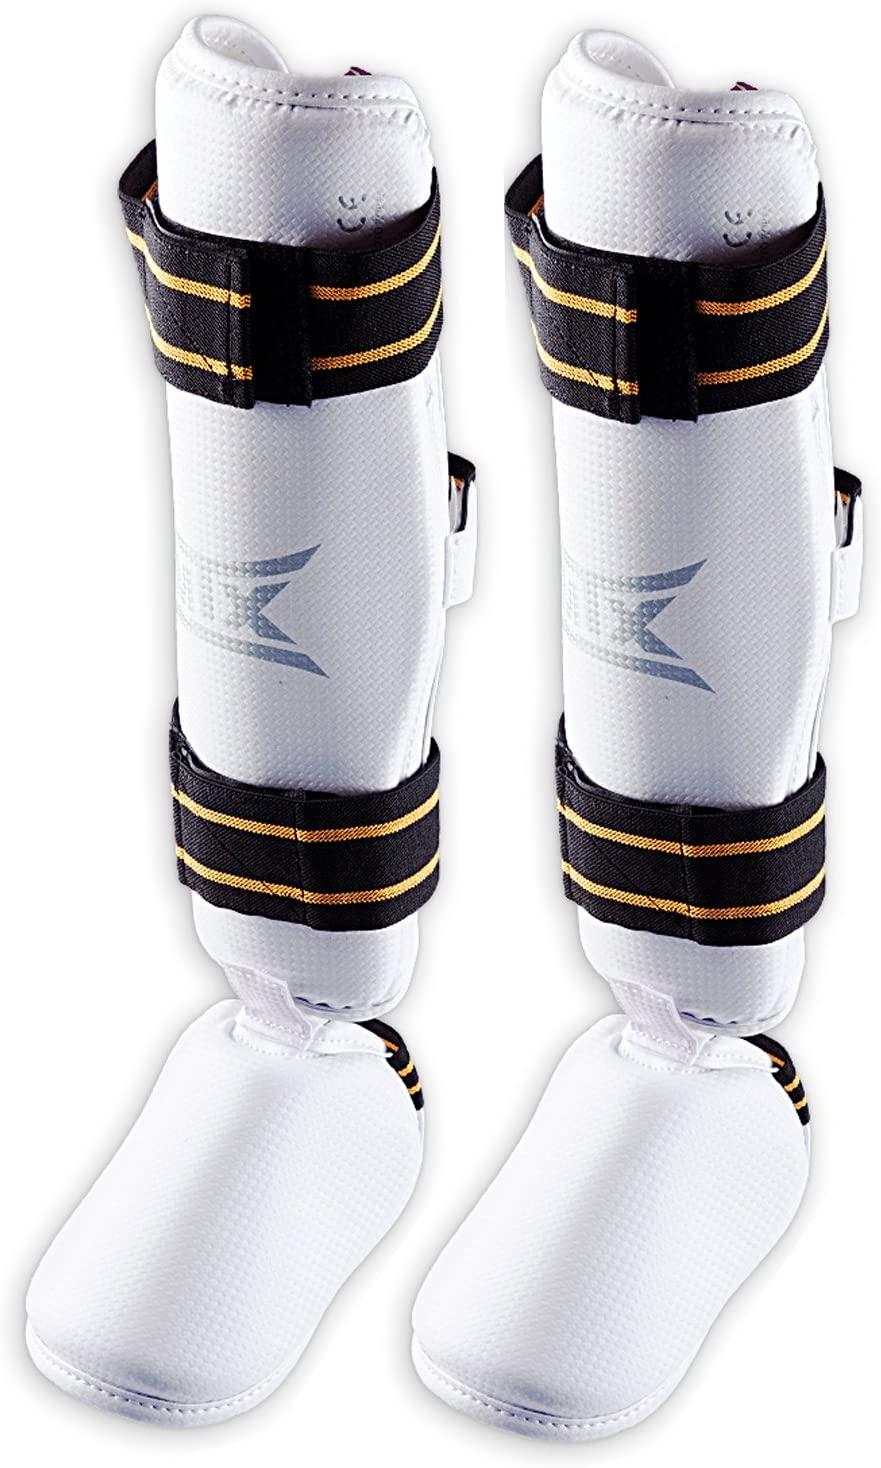 Mooto MTX New Taekwondo Shin Instep Protector Knee Leg Guard WTF Approved TKD XS to XL